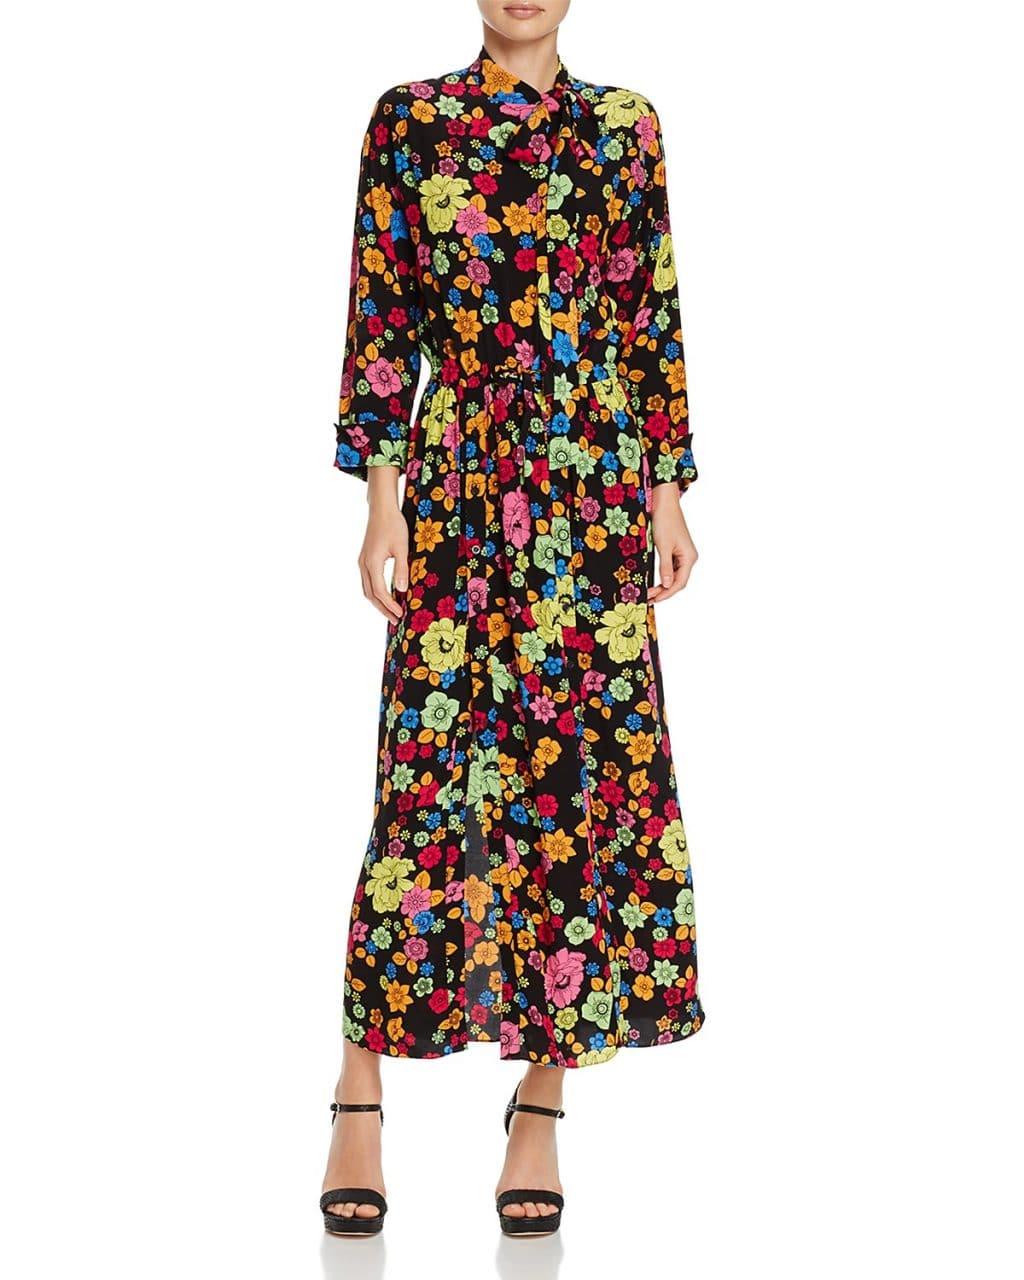 d22d0334b4a BOUTIQUE MOSCHINO Silk Maxi Fantasy Print Black   Floral Printed Dress